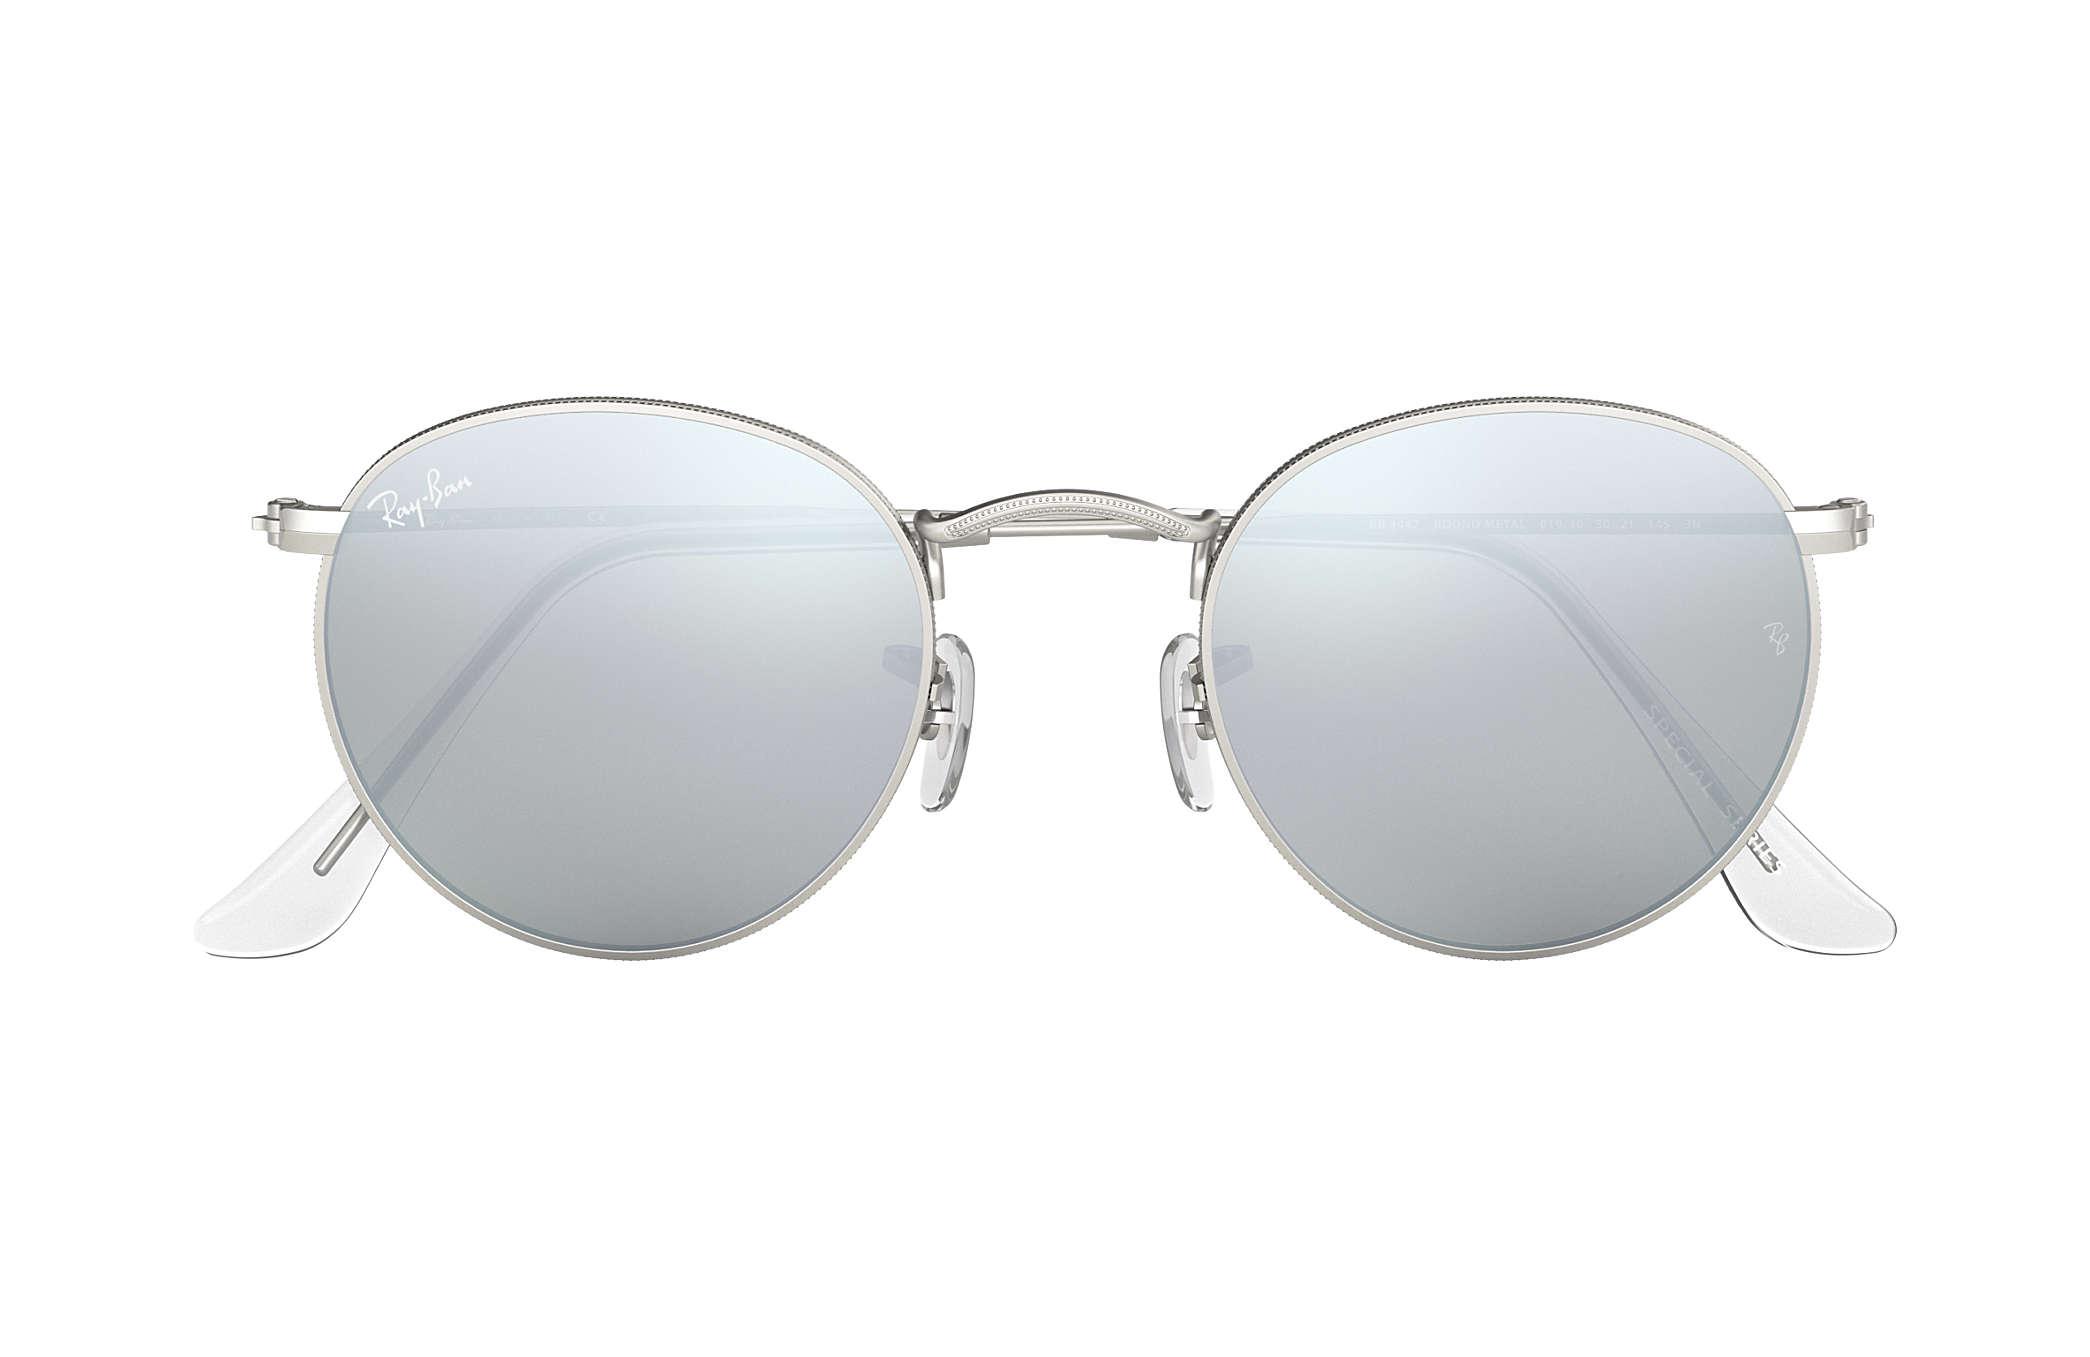 0e044cdf55b Ray-Ban Round Flash Lenses RB3447 Silver - Metal - Silver Lenses ...